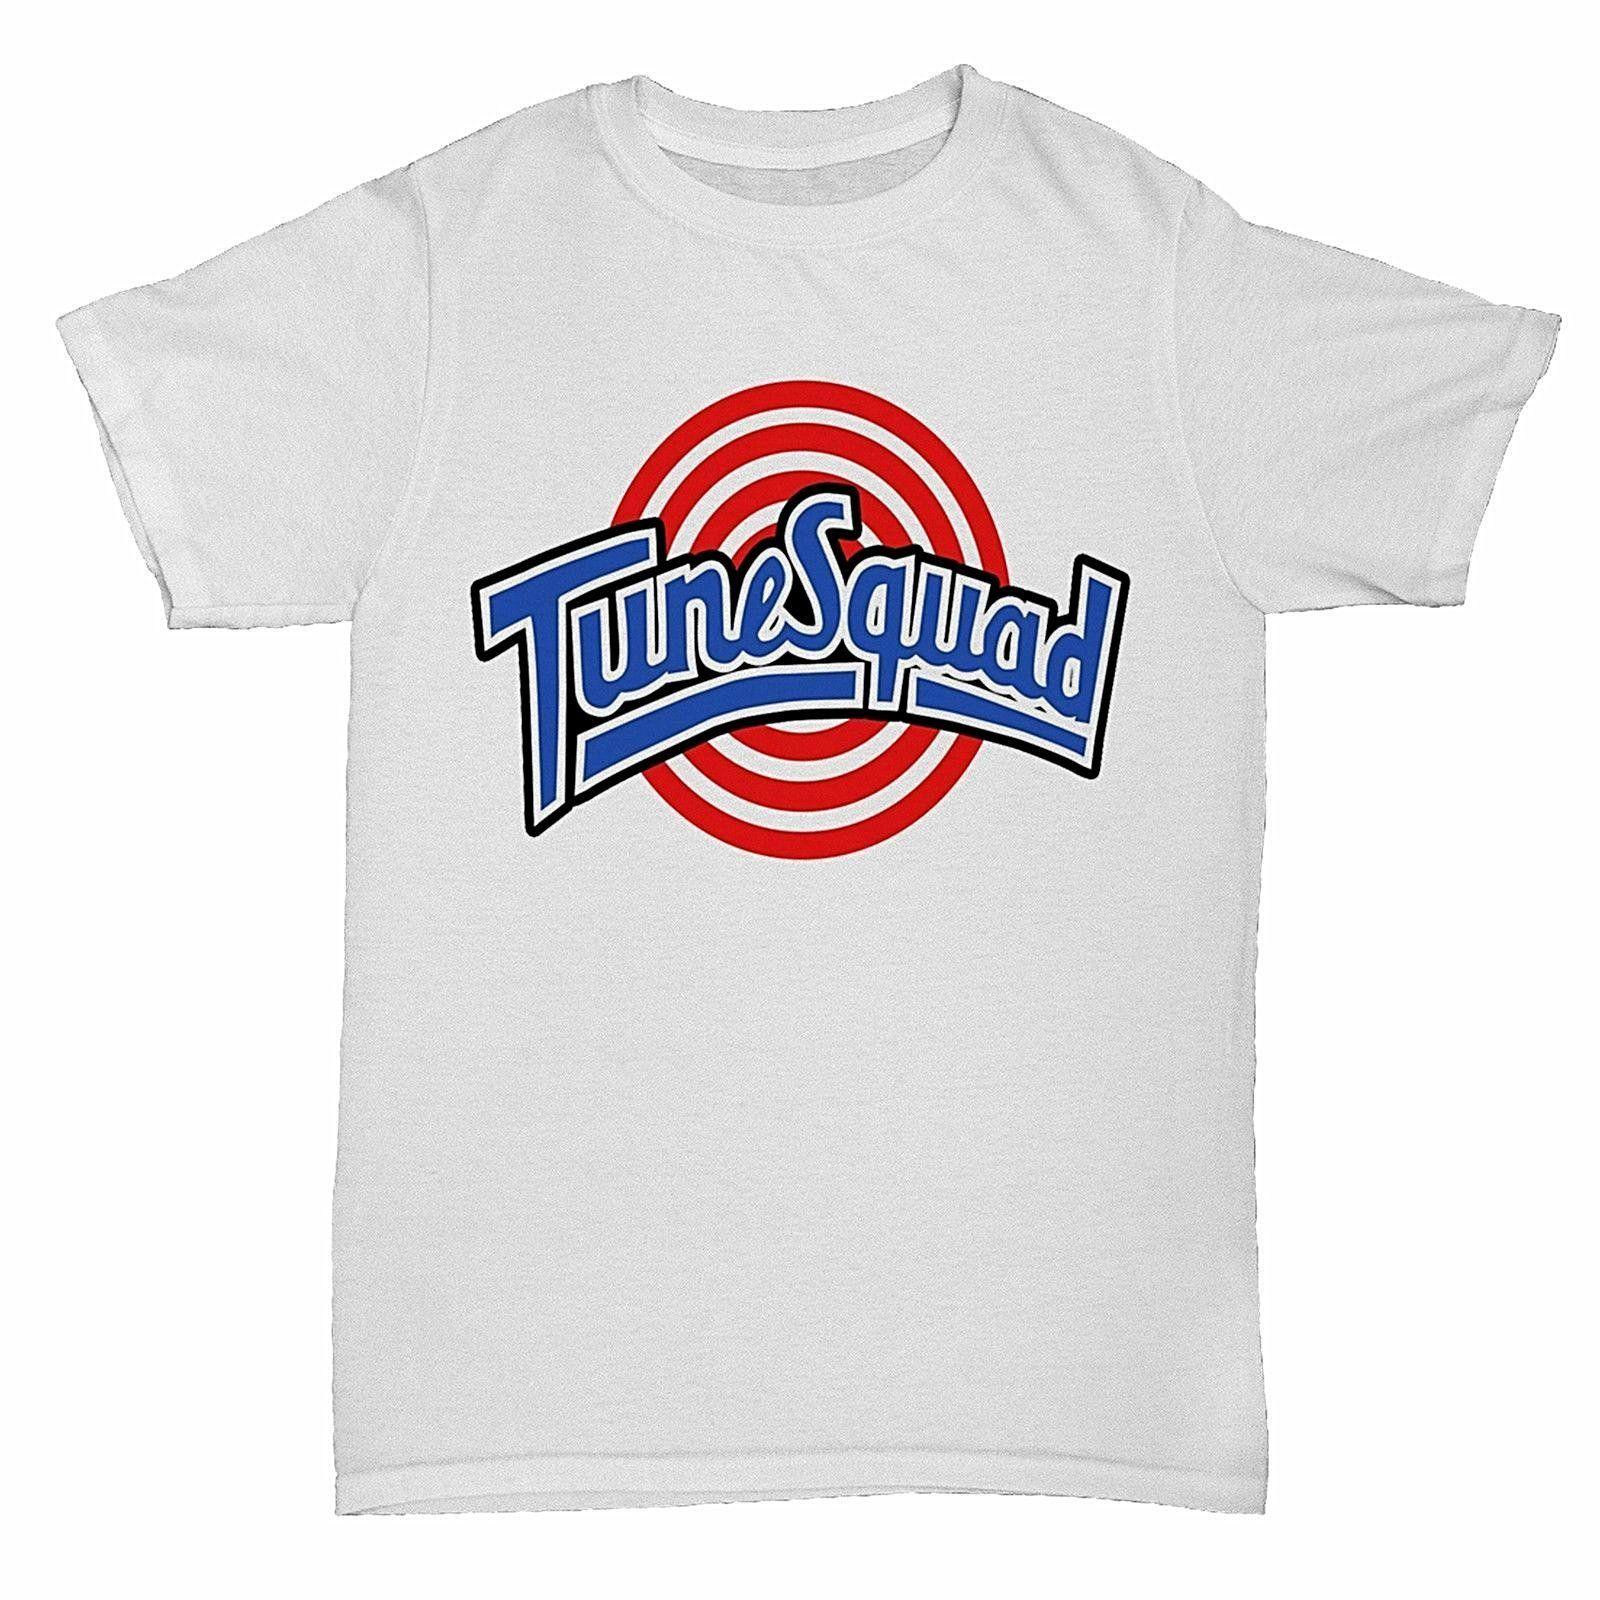 ceca78d56 Compre SPACE JAM Tune Squad T Shirt Camiseta Personalizada Logo Texto Foto  Para Mujer T Shirt Hombre Camiseta Hombre Roca Unisex Camiseta Moda Fresca  A ...